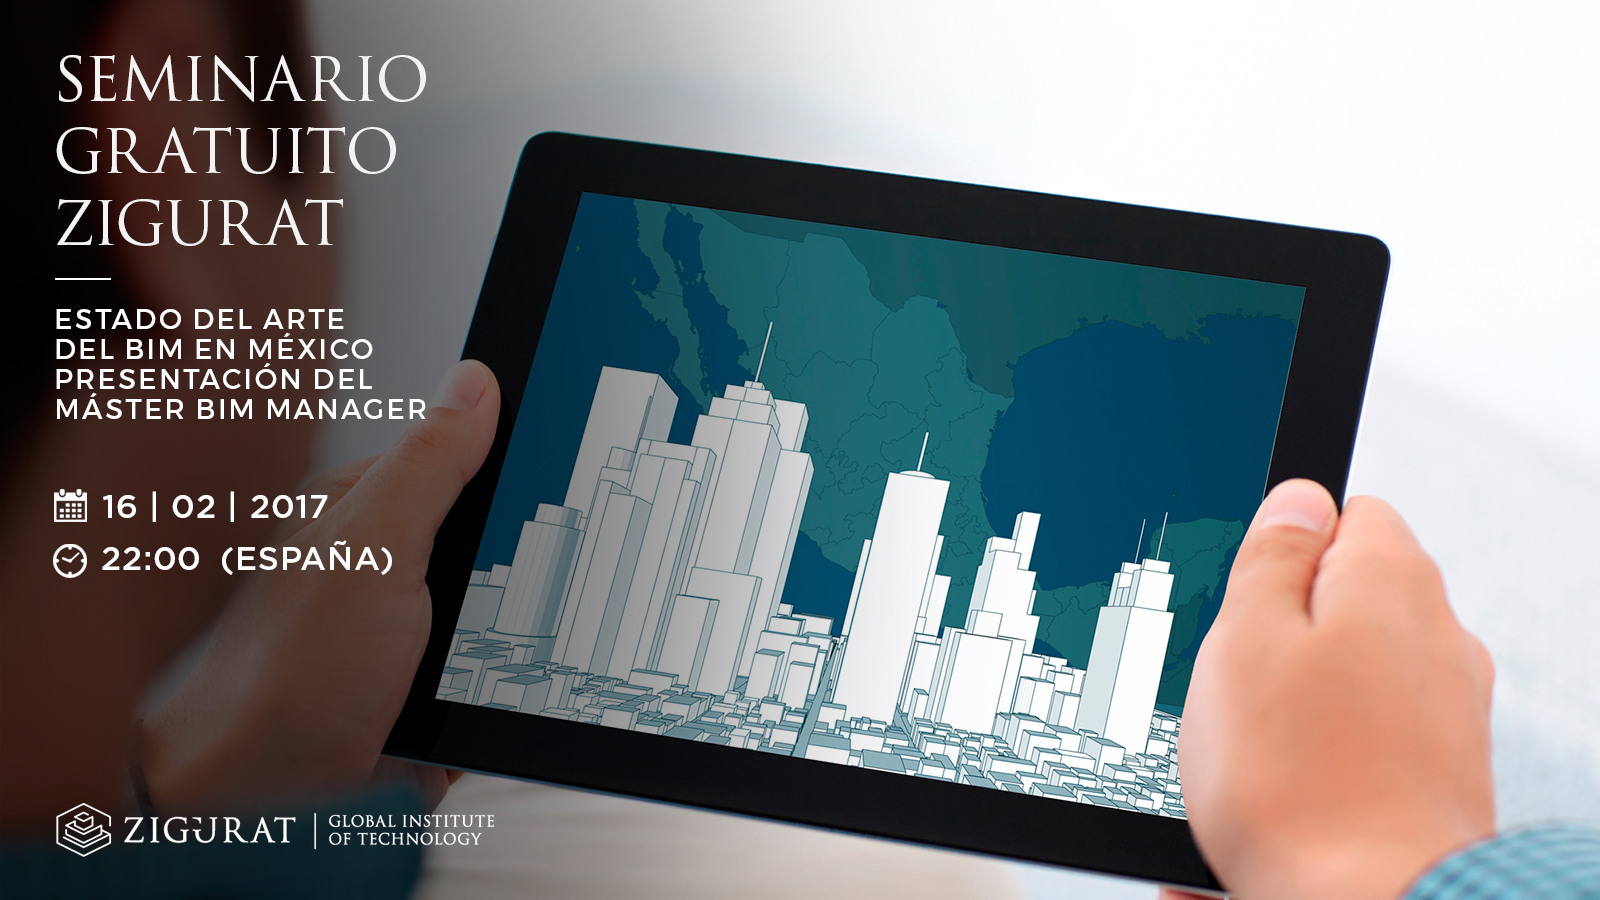 contexto-BIM-Mexico-zigurat-globa-insitute-technology